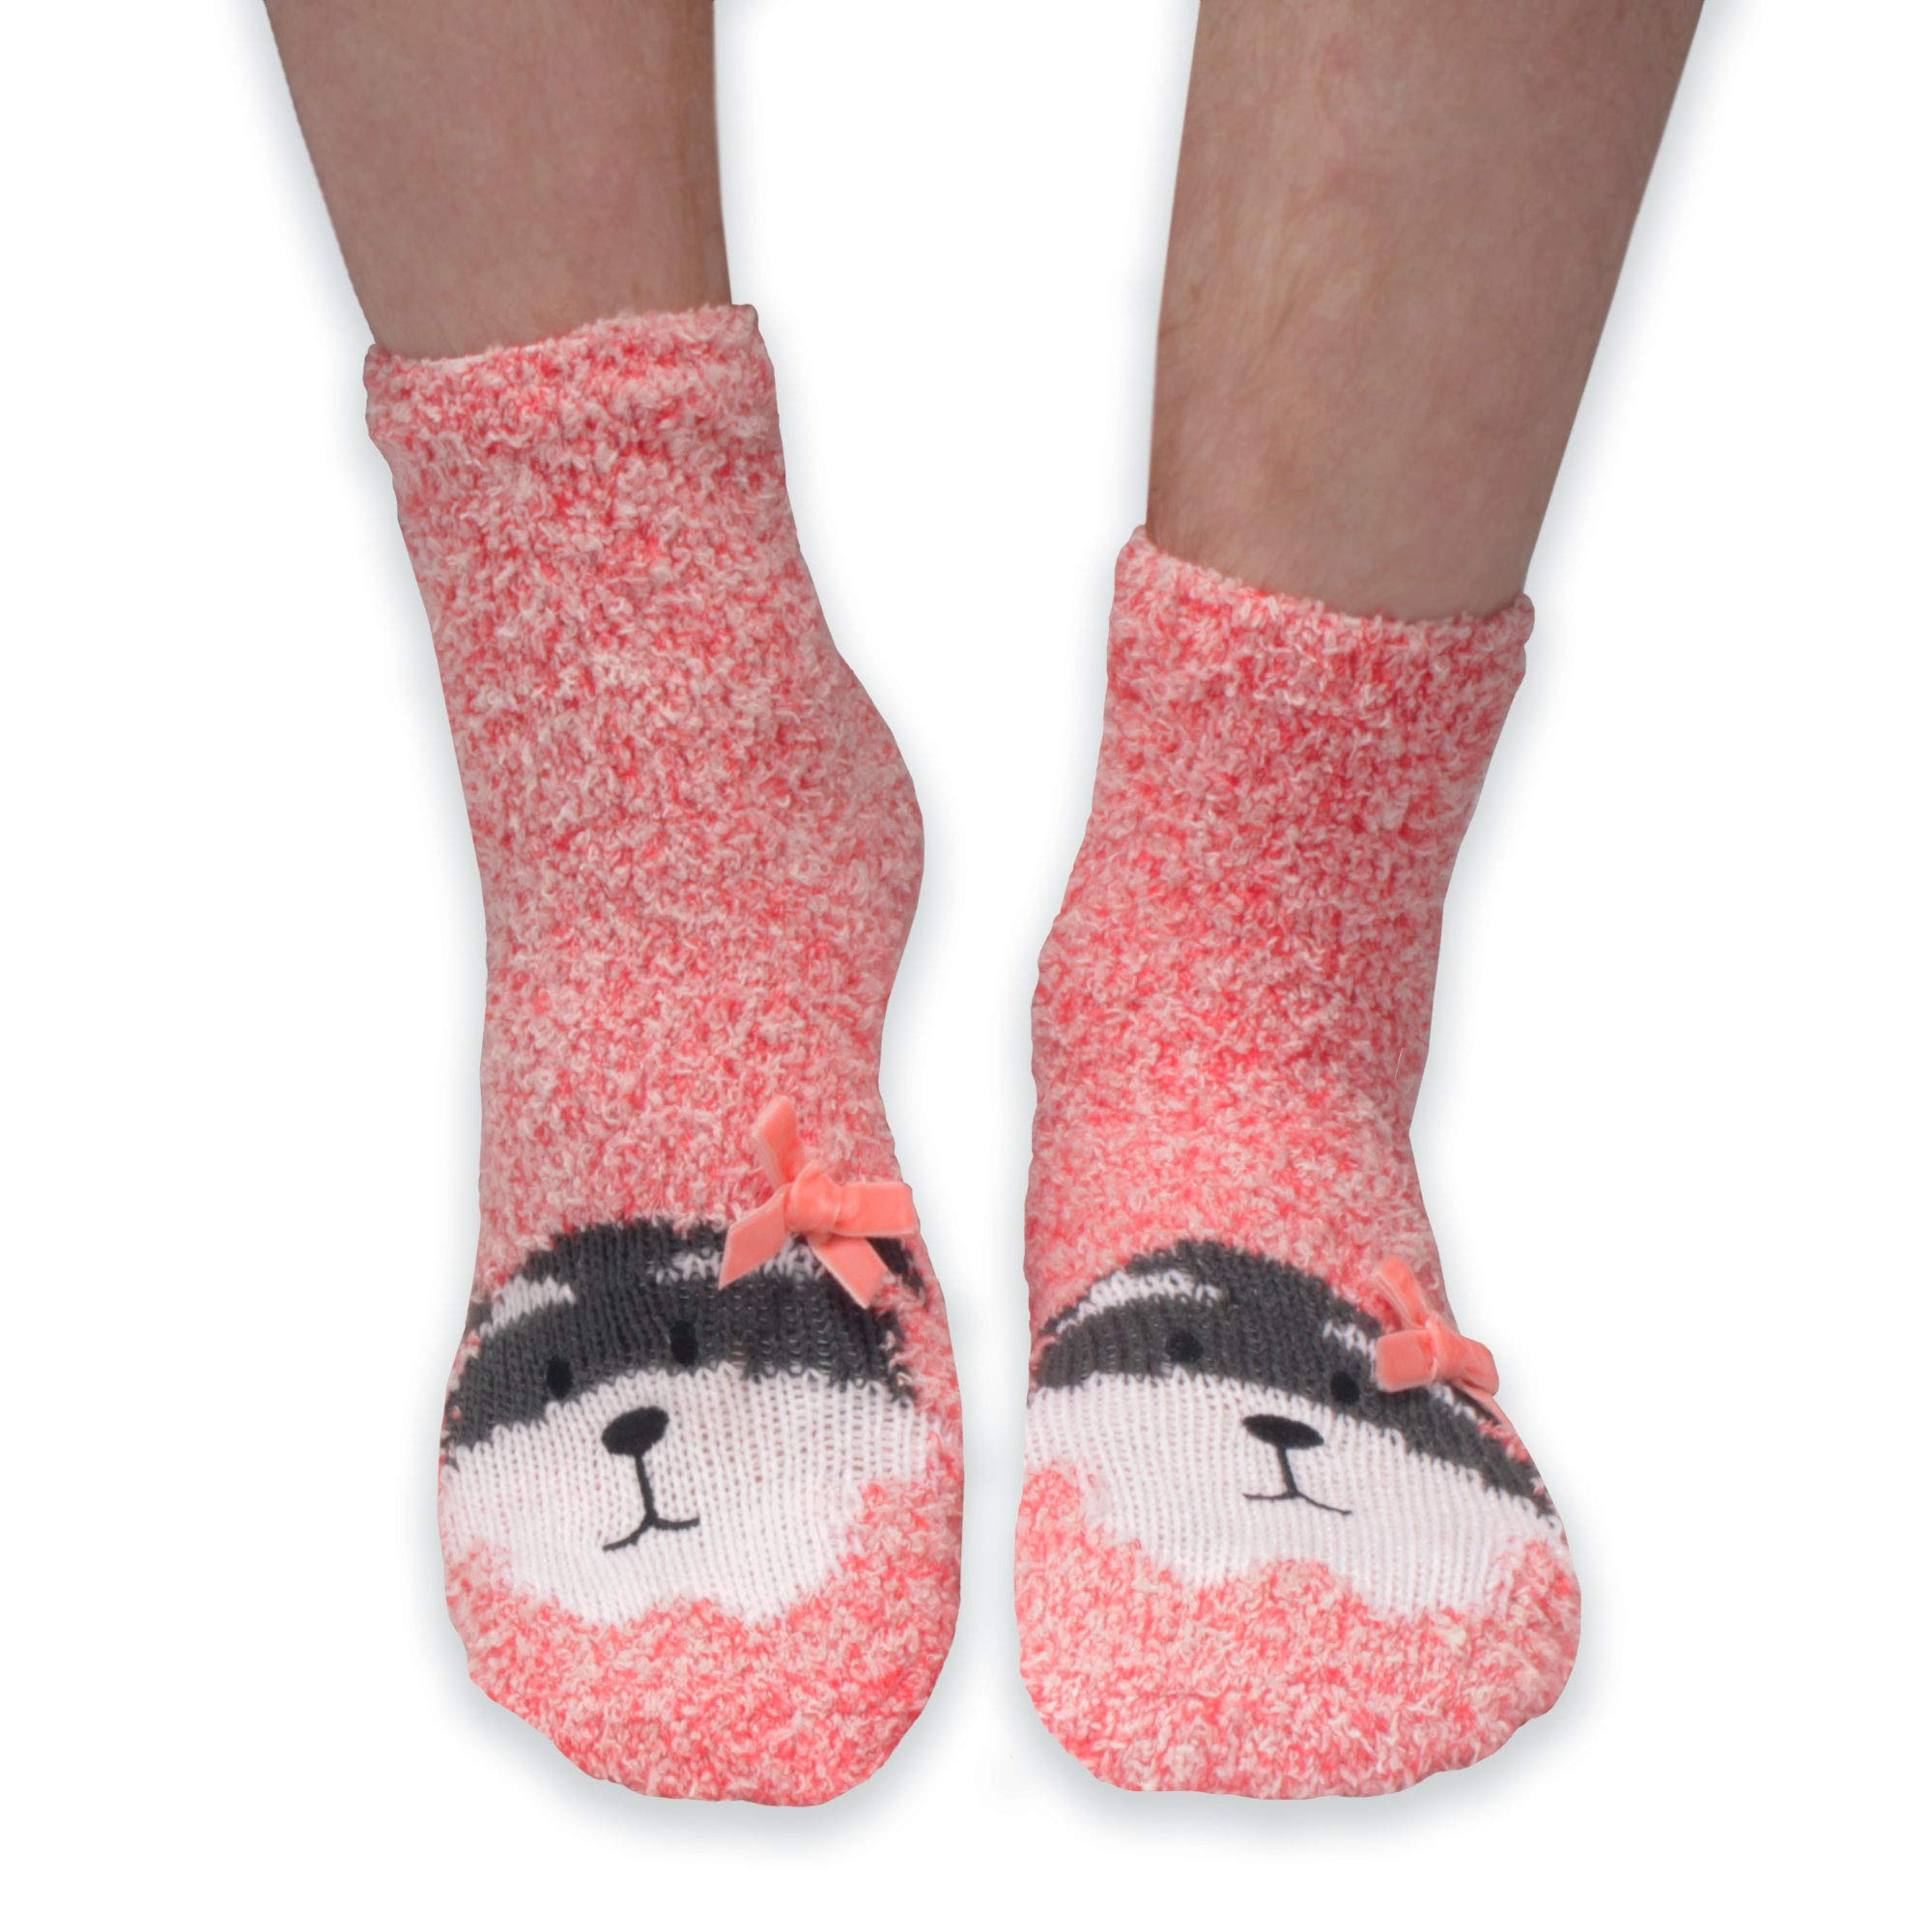 Super Soft Cozy Warm Cute Animal Non-Slip Fuzzy Crew Winter Socks, 1 Pair Raccoon